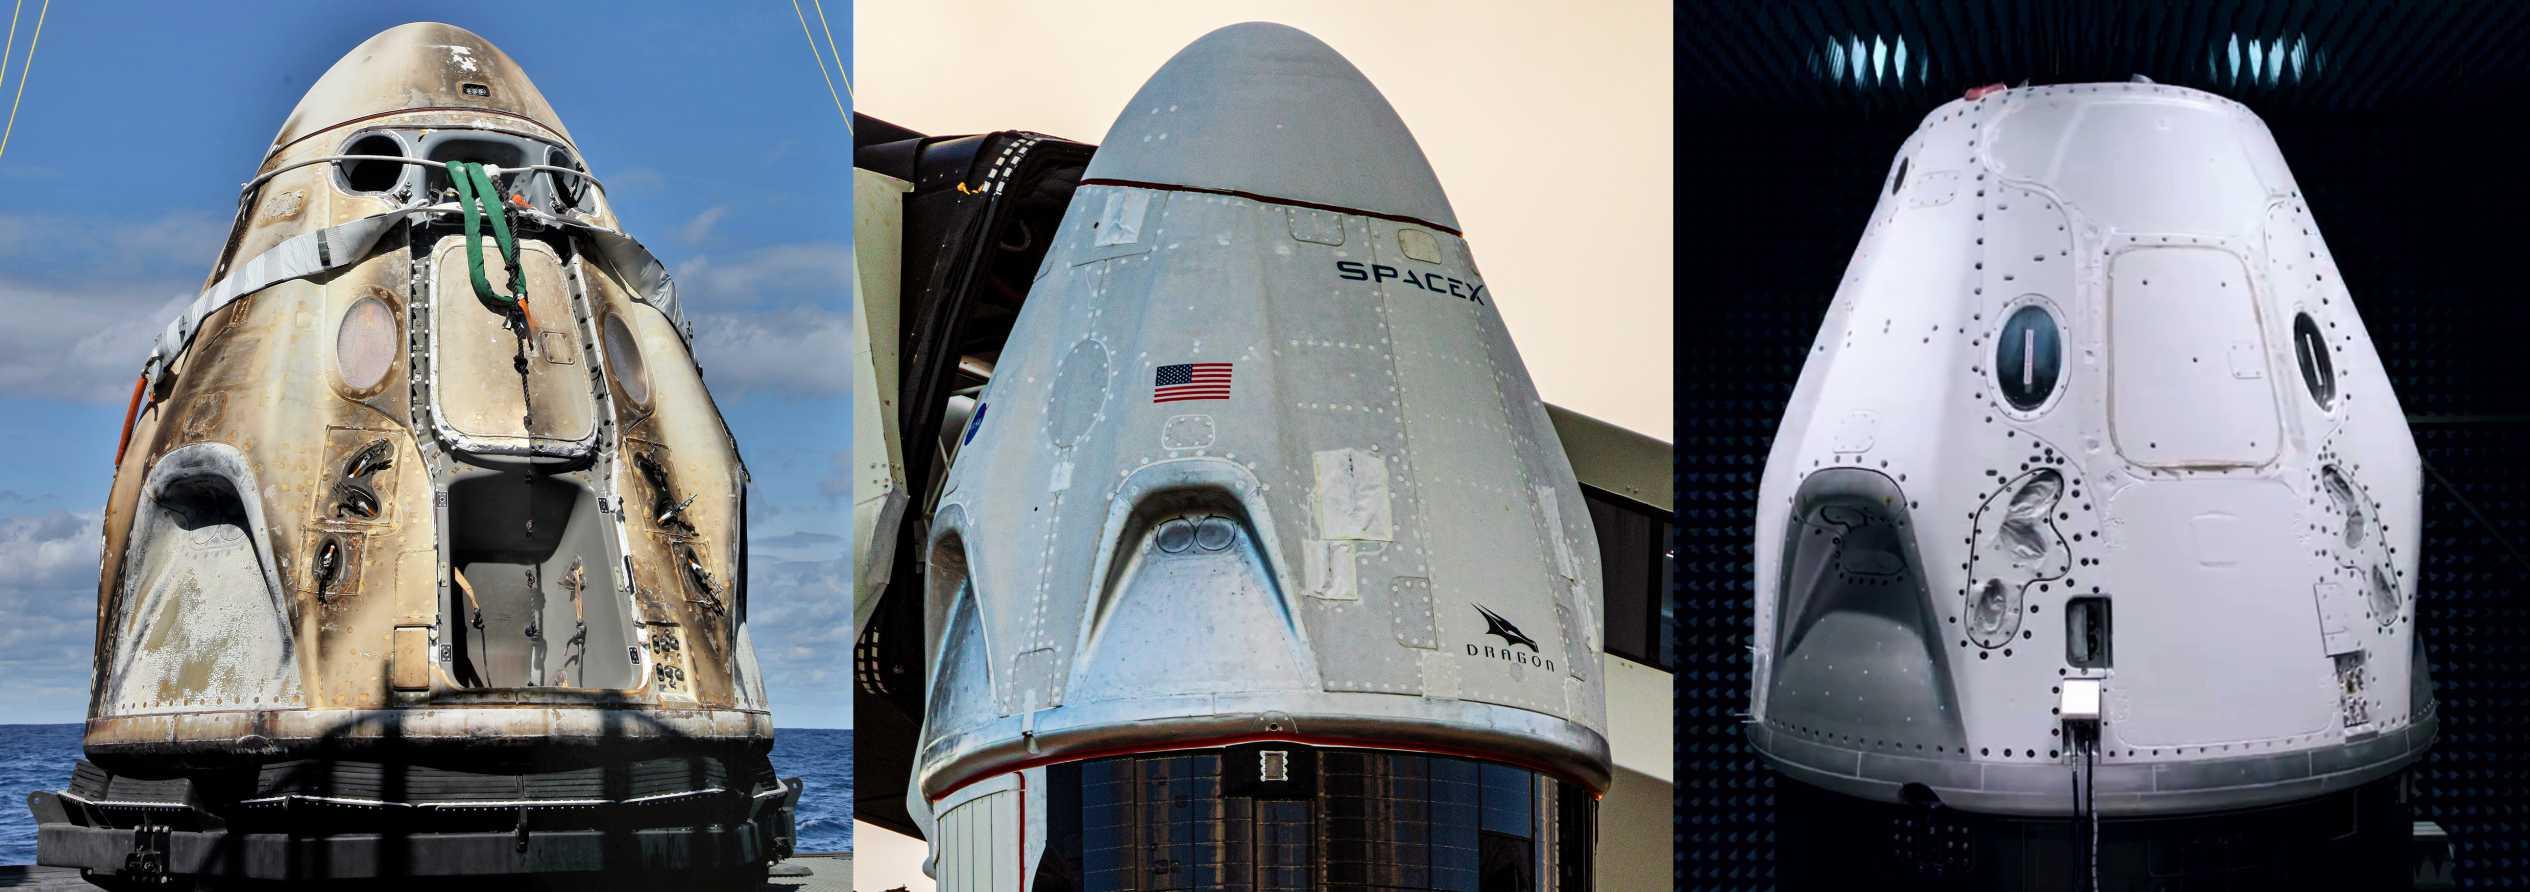 Crew Dragon C201 C205 C206 (NASA – SpaceX) 1 (c)